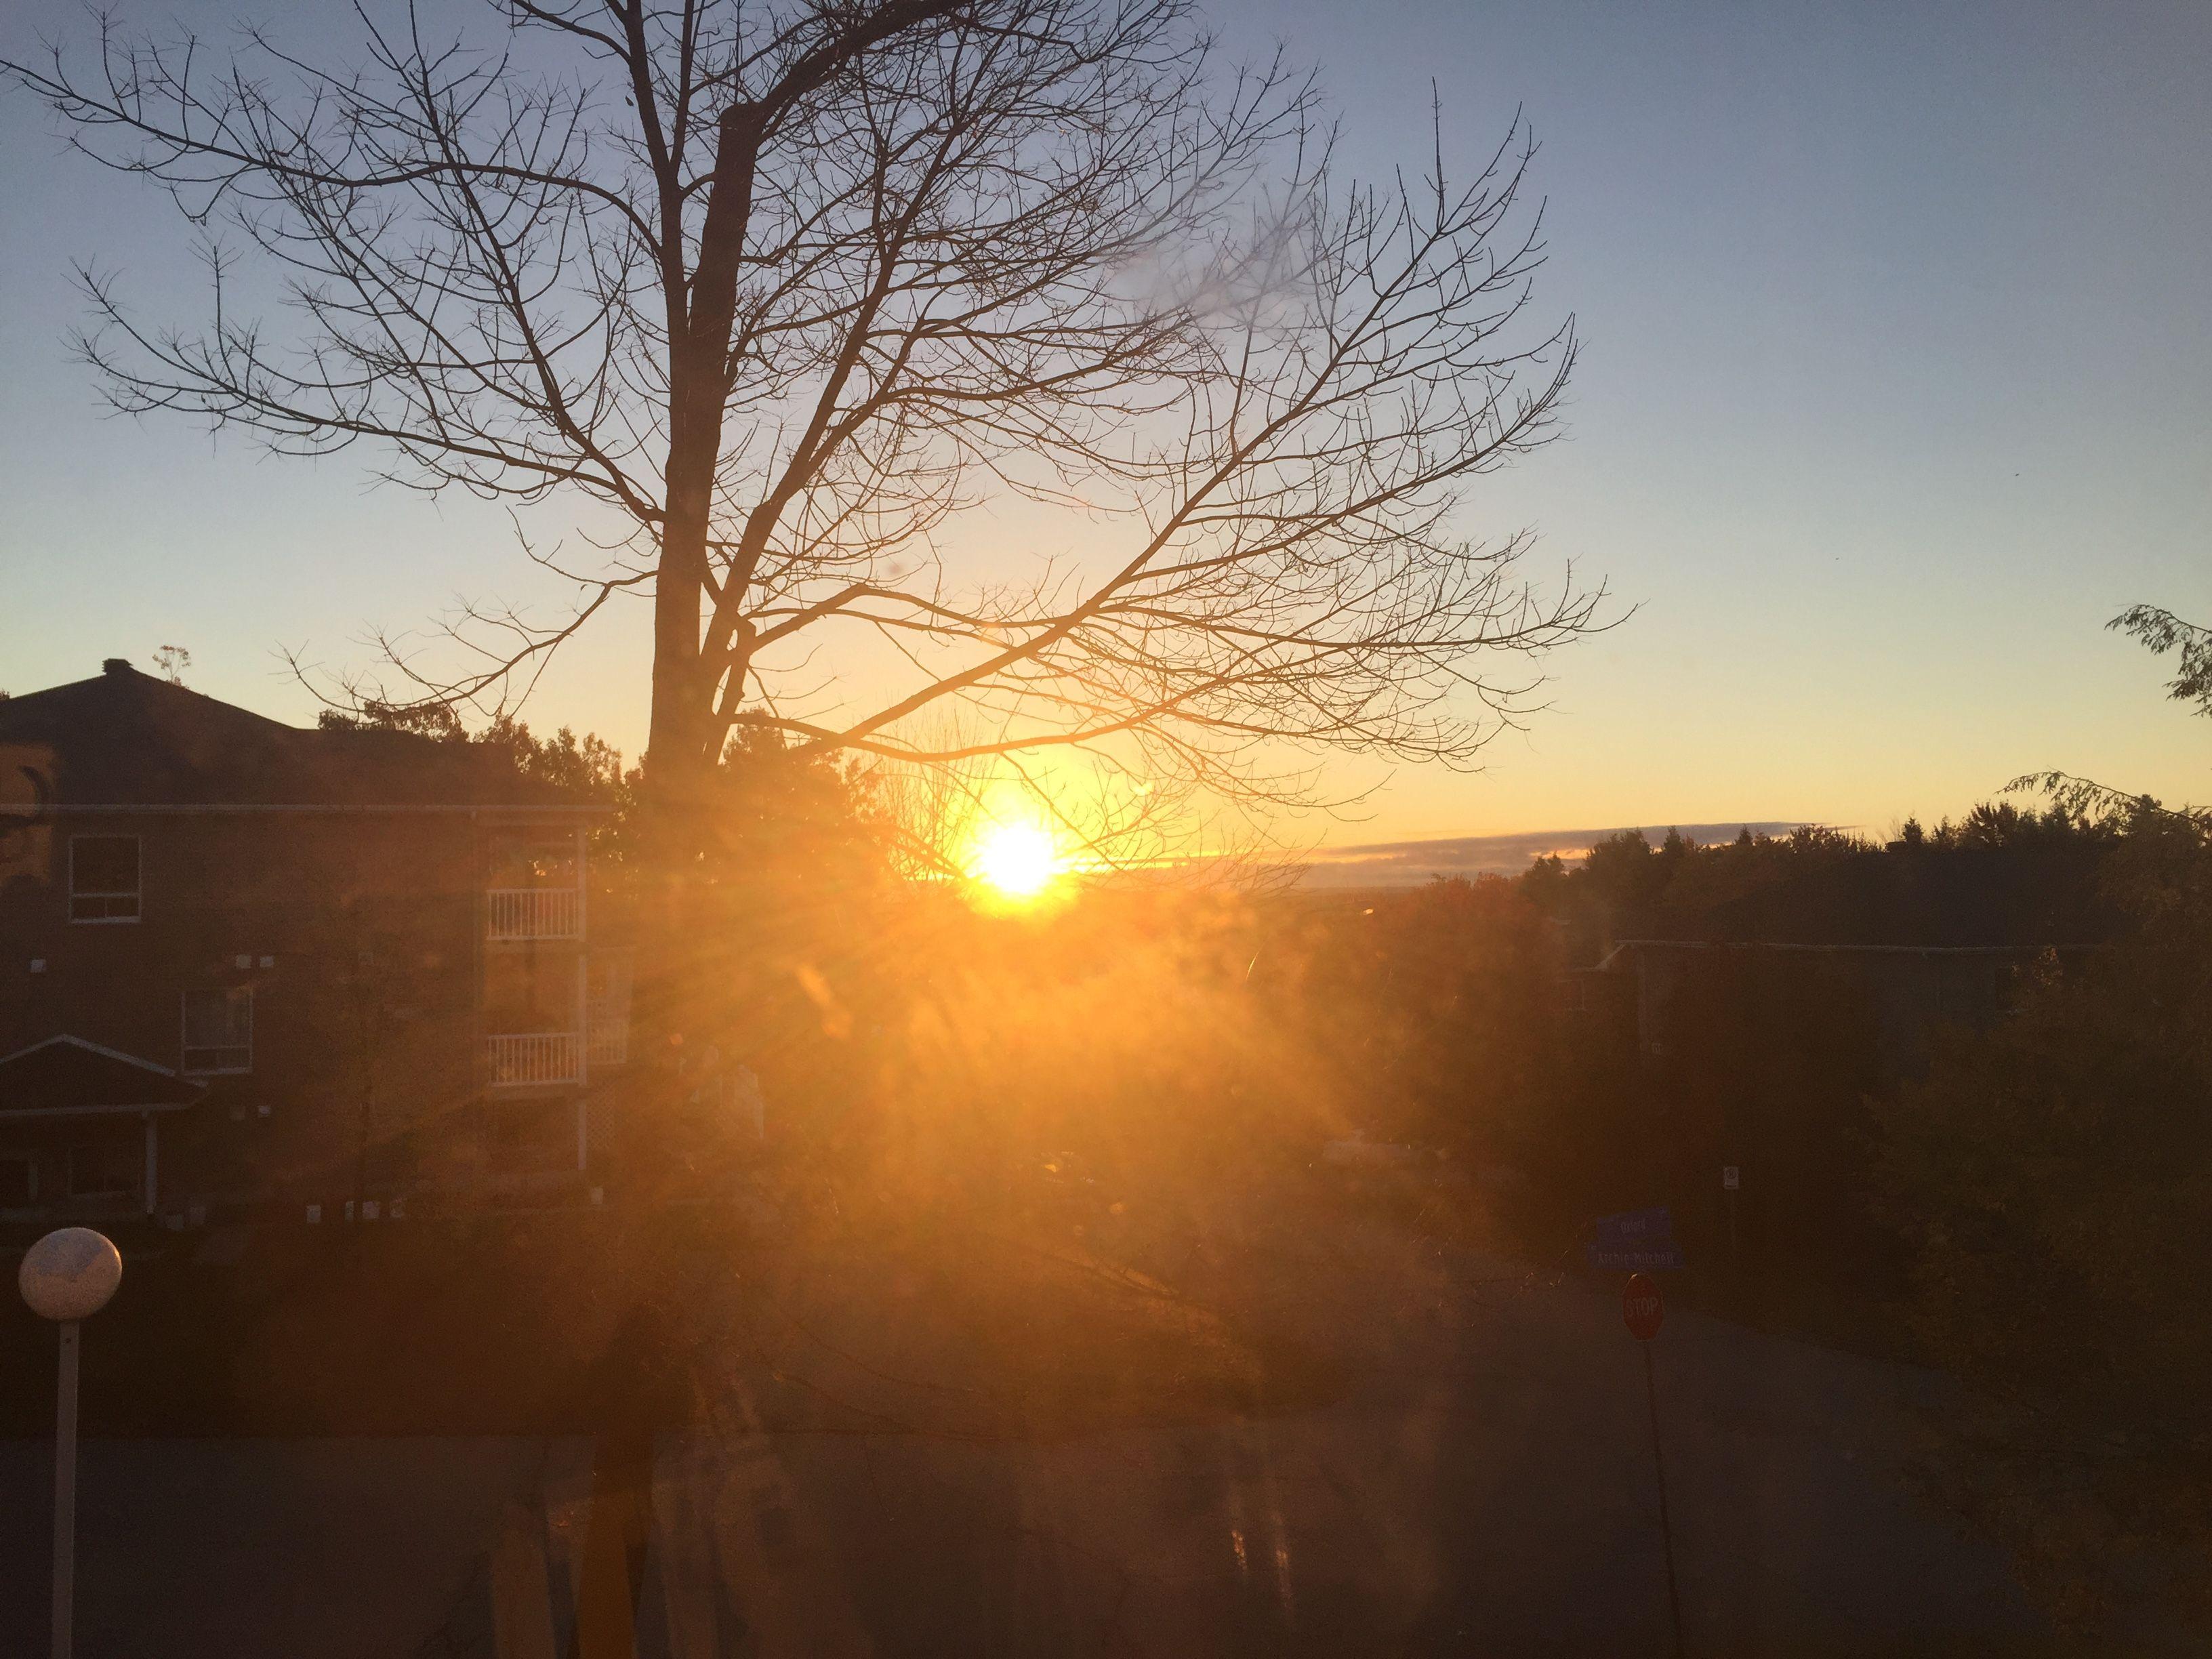 Sunrise in sherbrooke 📷 #Sunrise #Photography